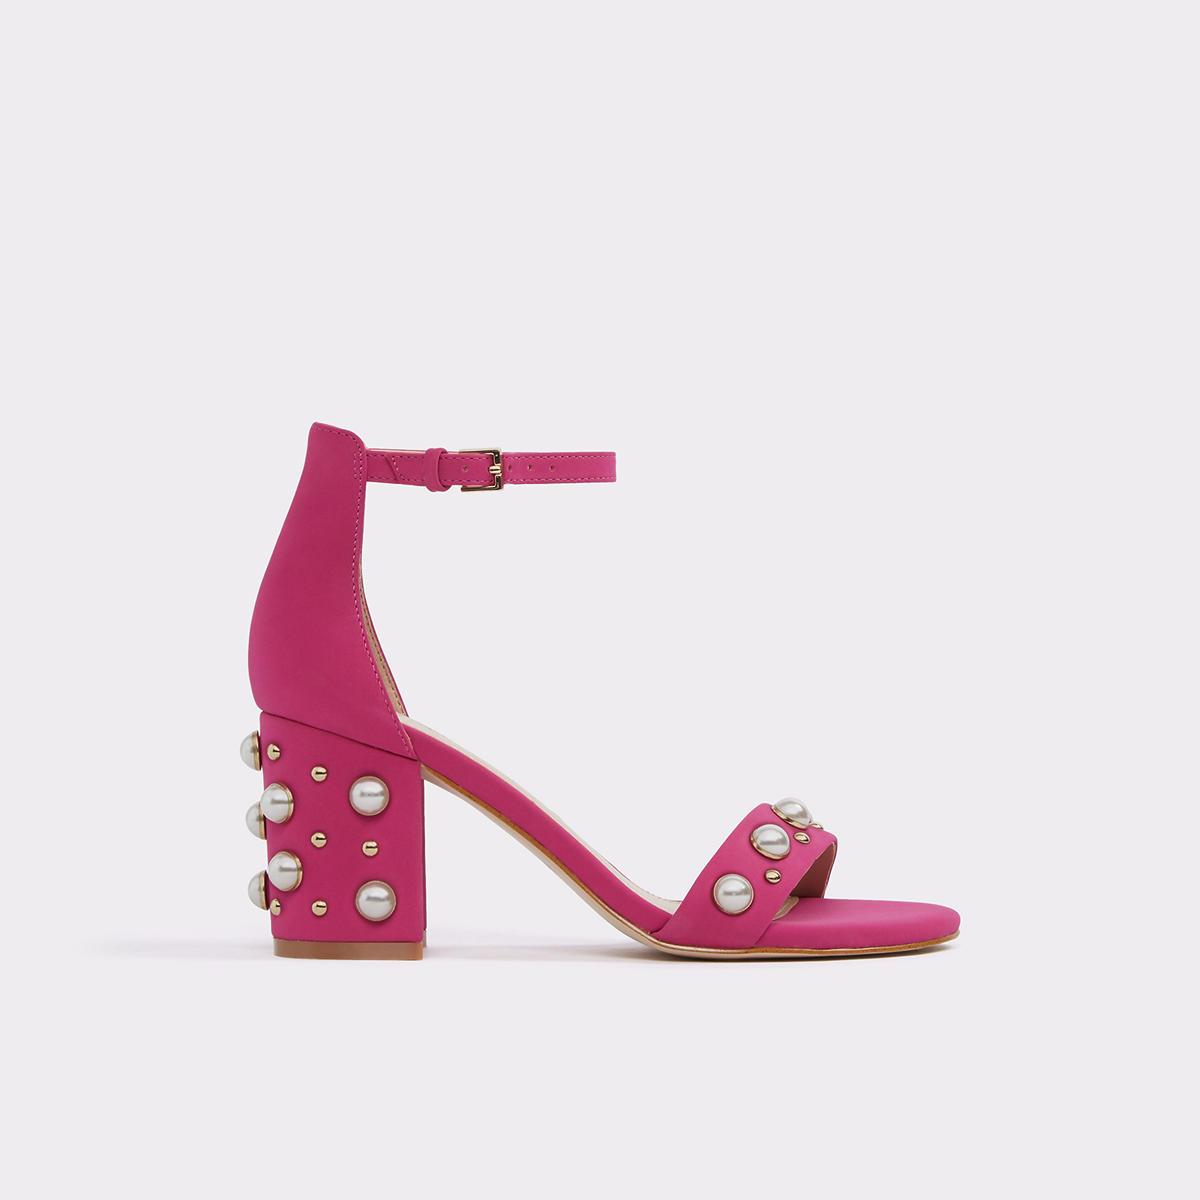 Majorca Fuschia Misc. Women's Block heels | ALDO US at Aldo Shoes in Victor, NY | Tuggl